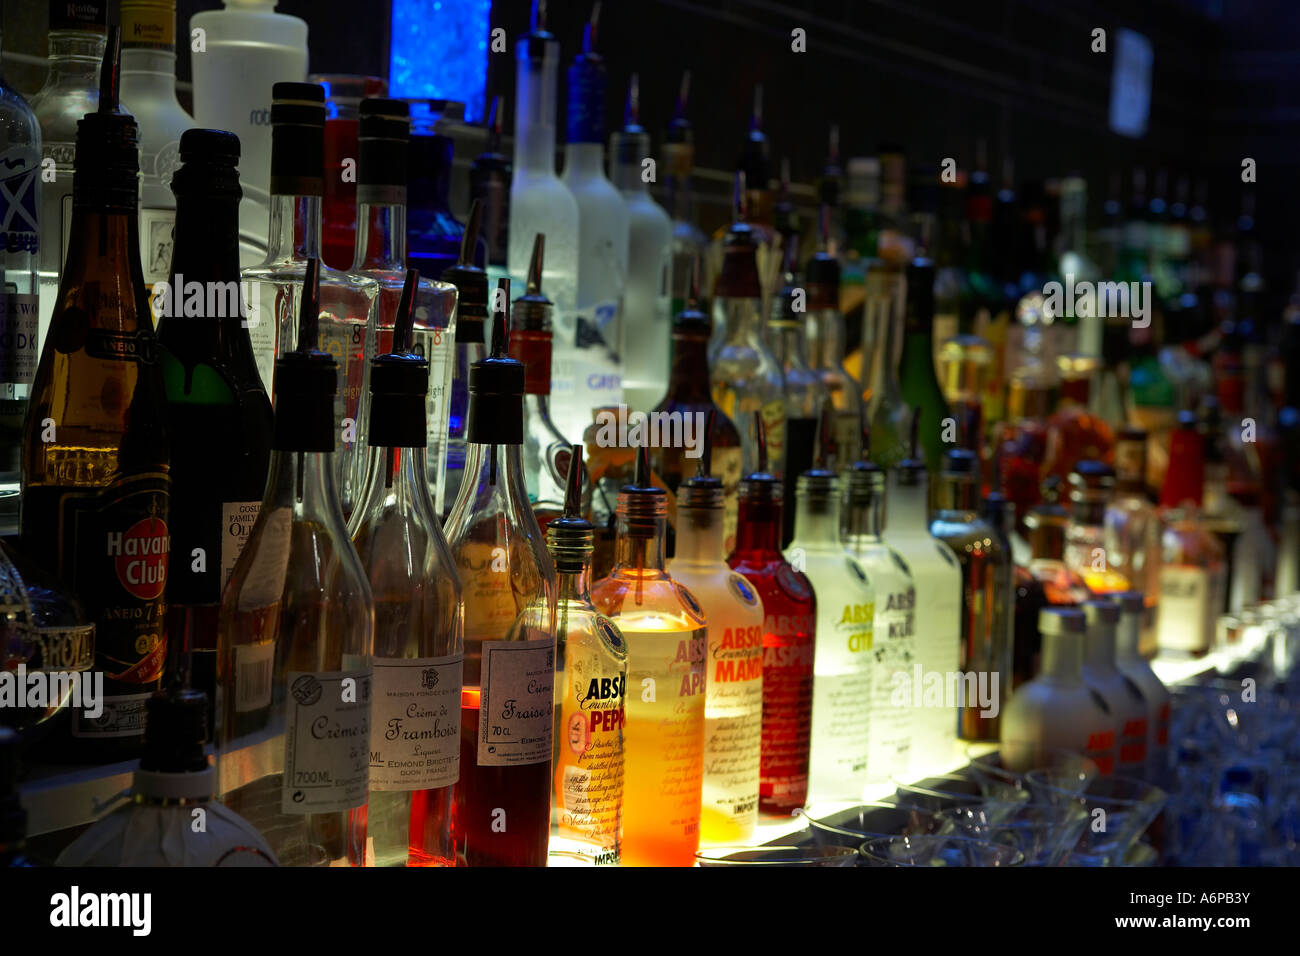 Bottles Back Bar Club In Stockfotos & Bottles Back Bar Club In ...